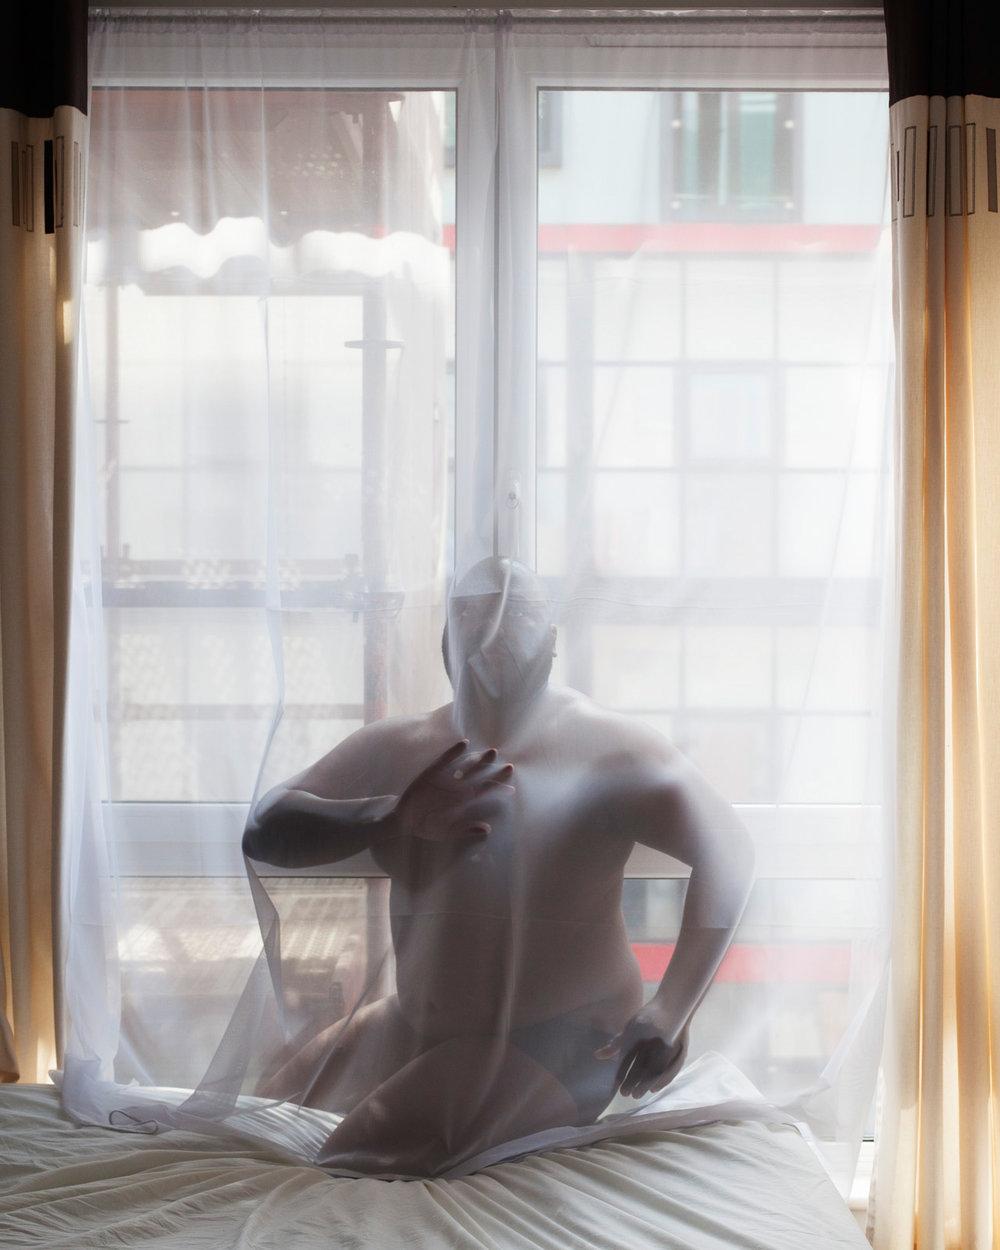 © Mickey Aloisio